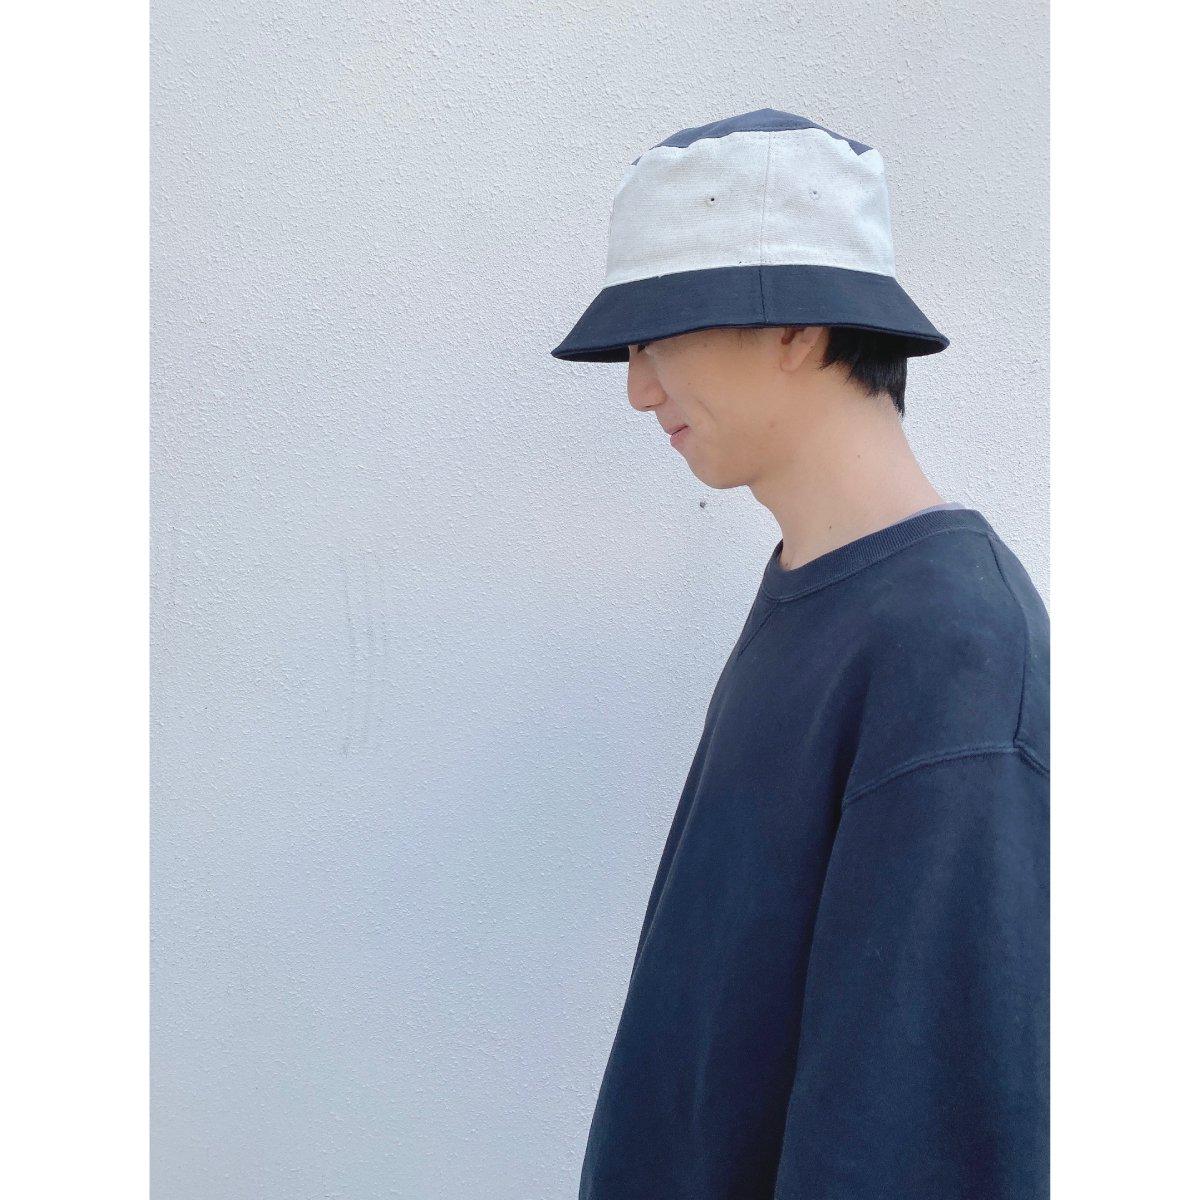 Repro Hat 詳細画像29